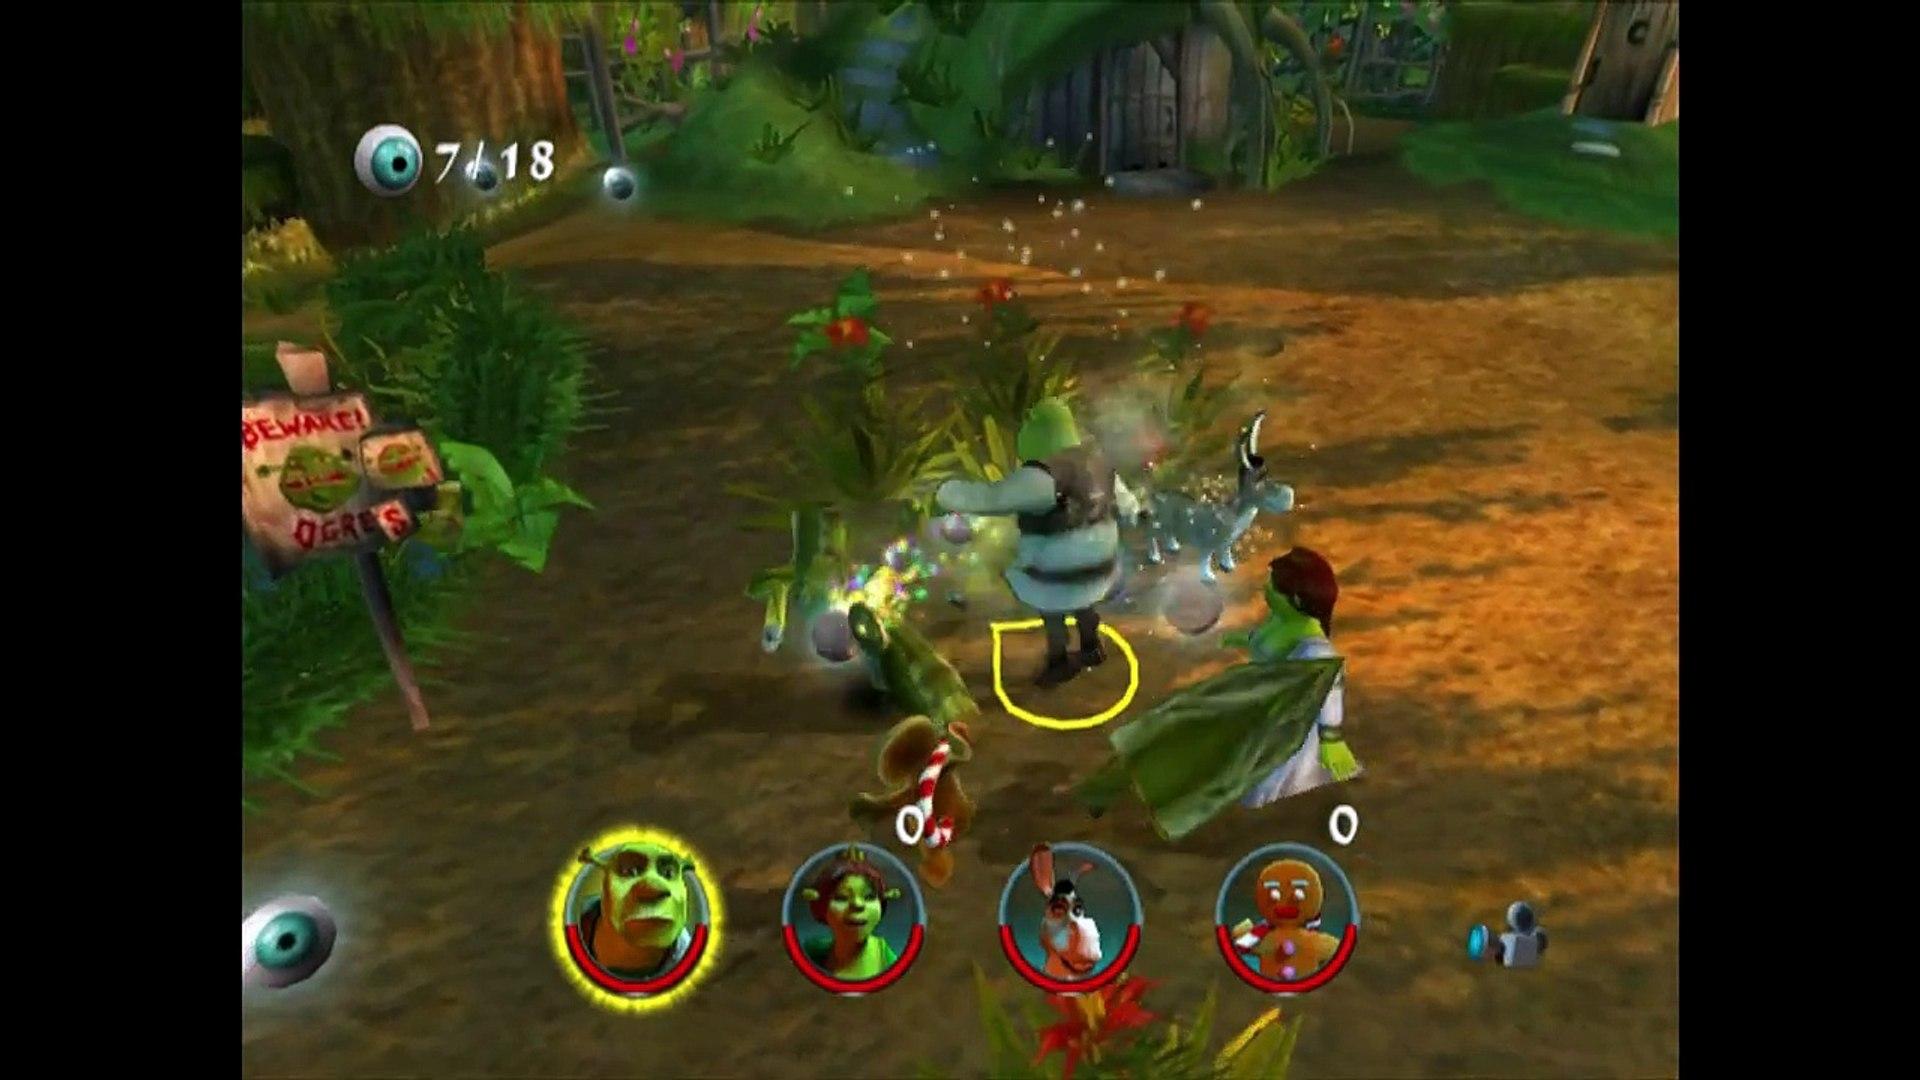 Shrek 2 Game Walkthrough Part 1 Shreks Swamp No Commentary Gameplay Gamecube Xbox P Dailymotion Video